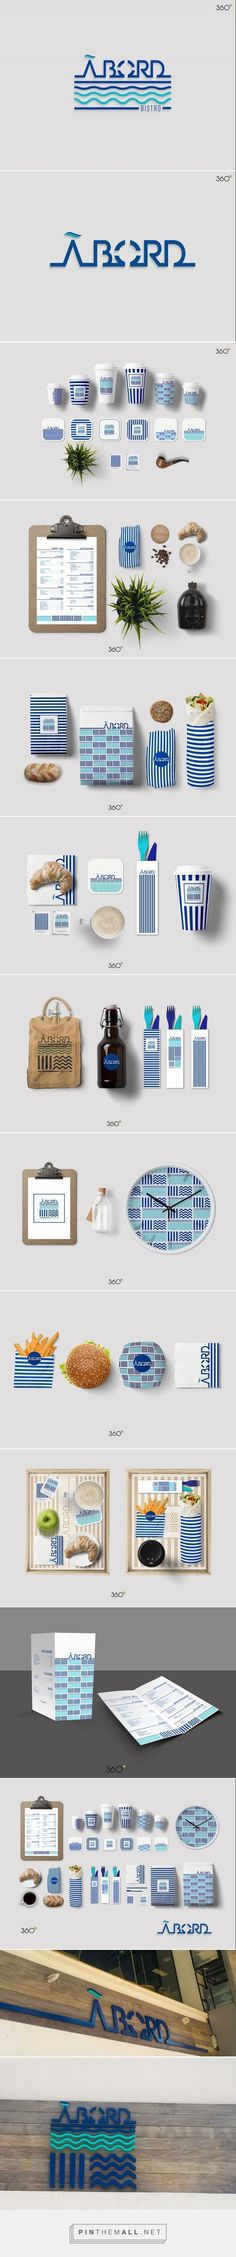 Aboard Branding on Behance | Fivestar Branding – Design and Branding Agency & Inspiration Gallery